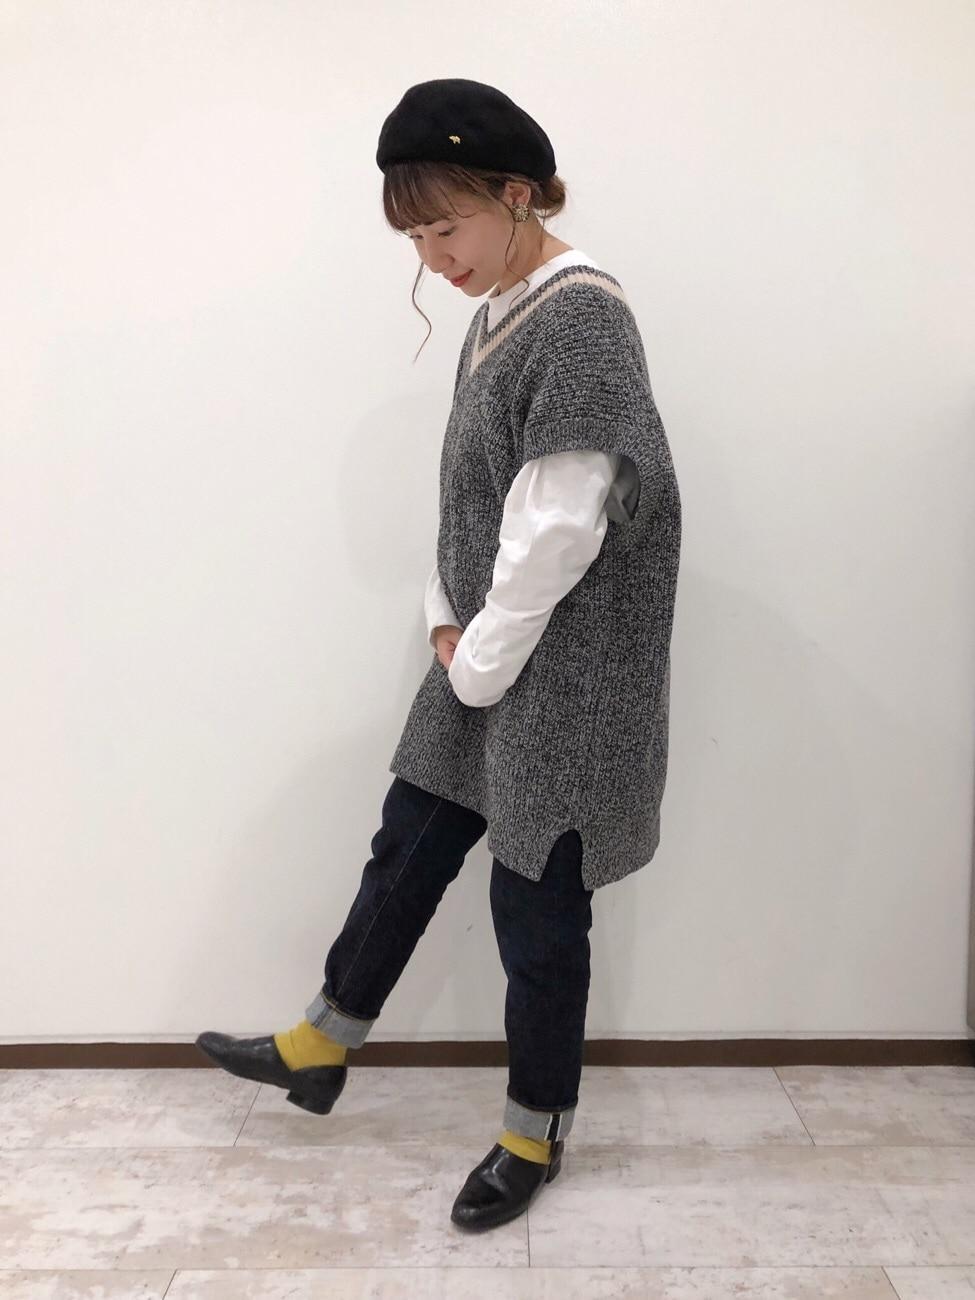 Dot and Stripes CHILD WOMAN ルミネ池袋 身長:158cm 2019.09.29